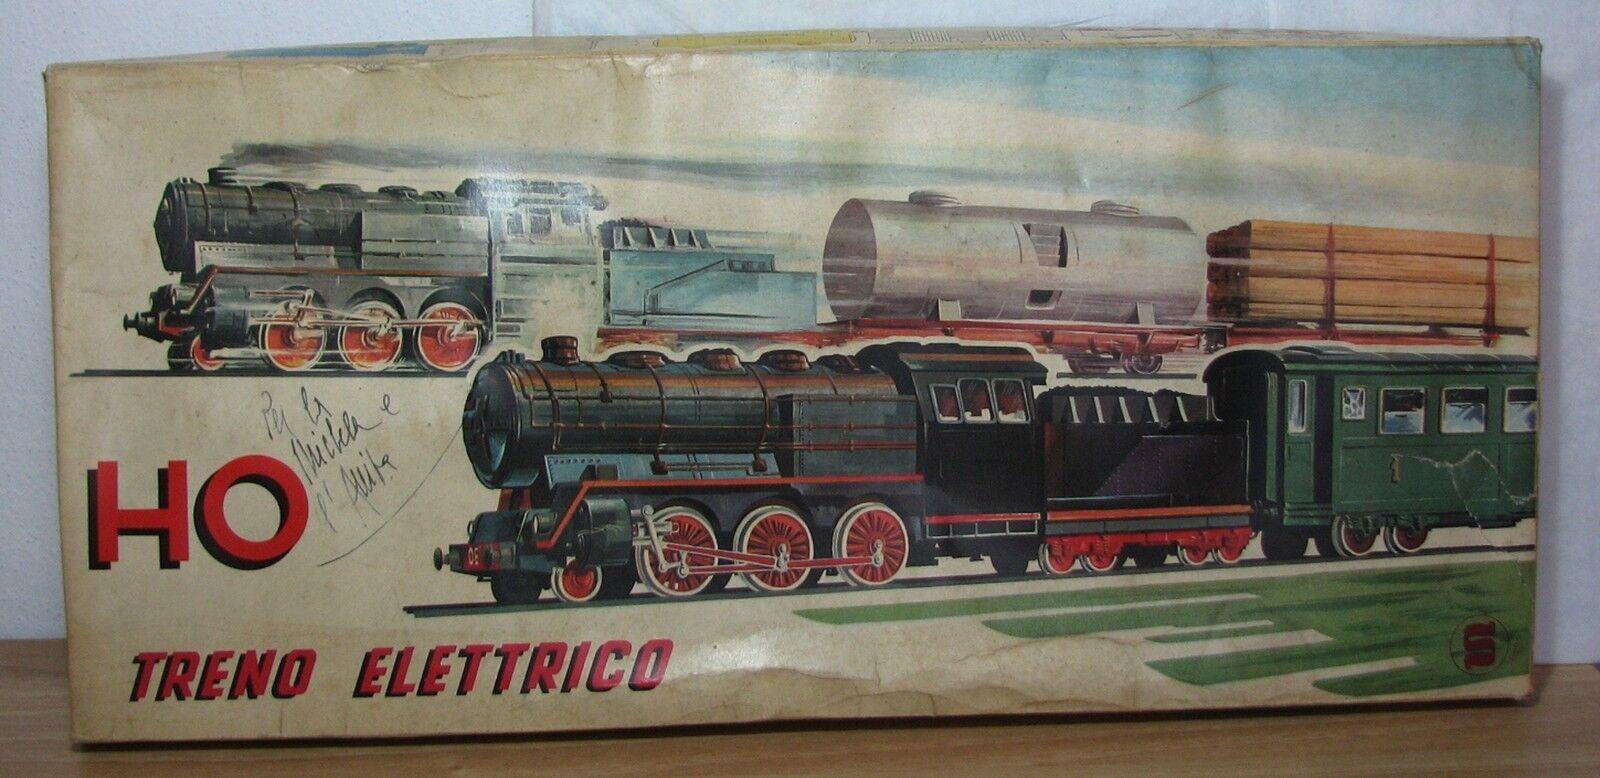 INGAP - TRENO ELETTRICO A BATTERIA HO - ART. 1004 SN MERCI REF. 1230 - ANNI '60